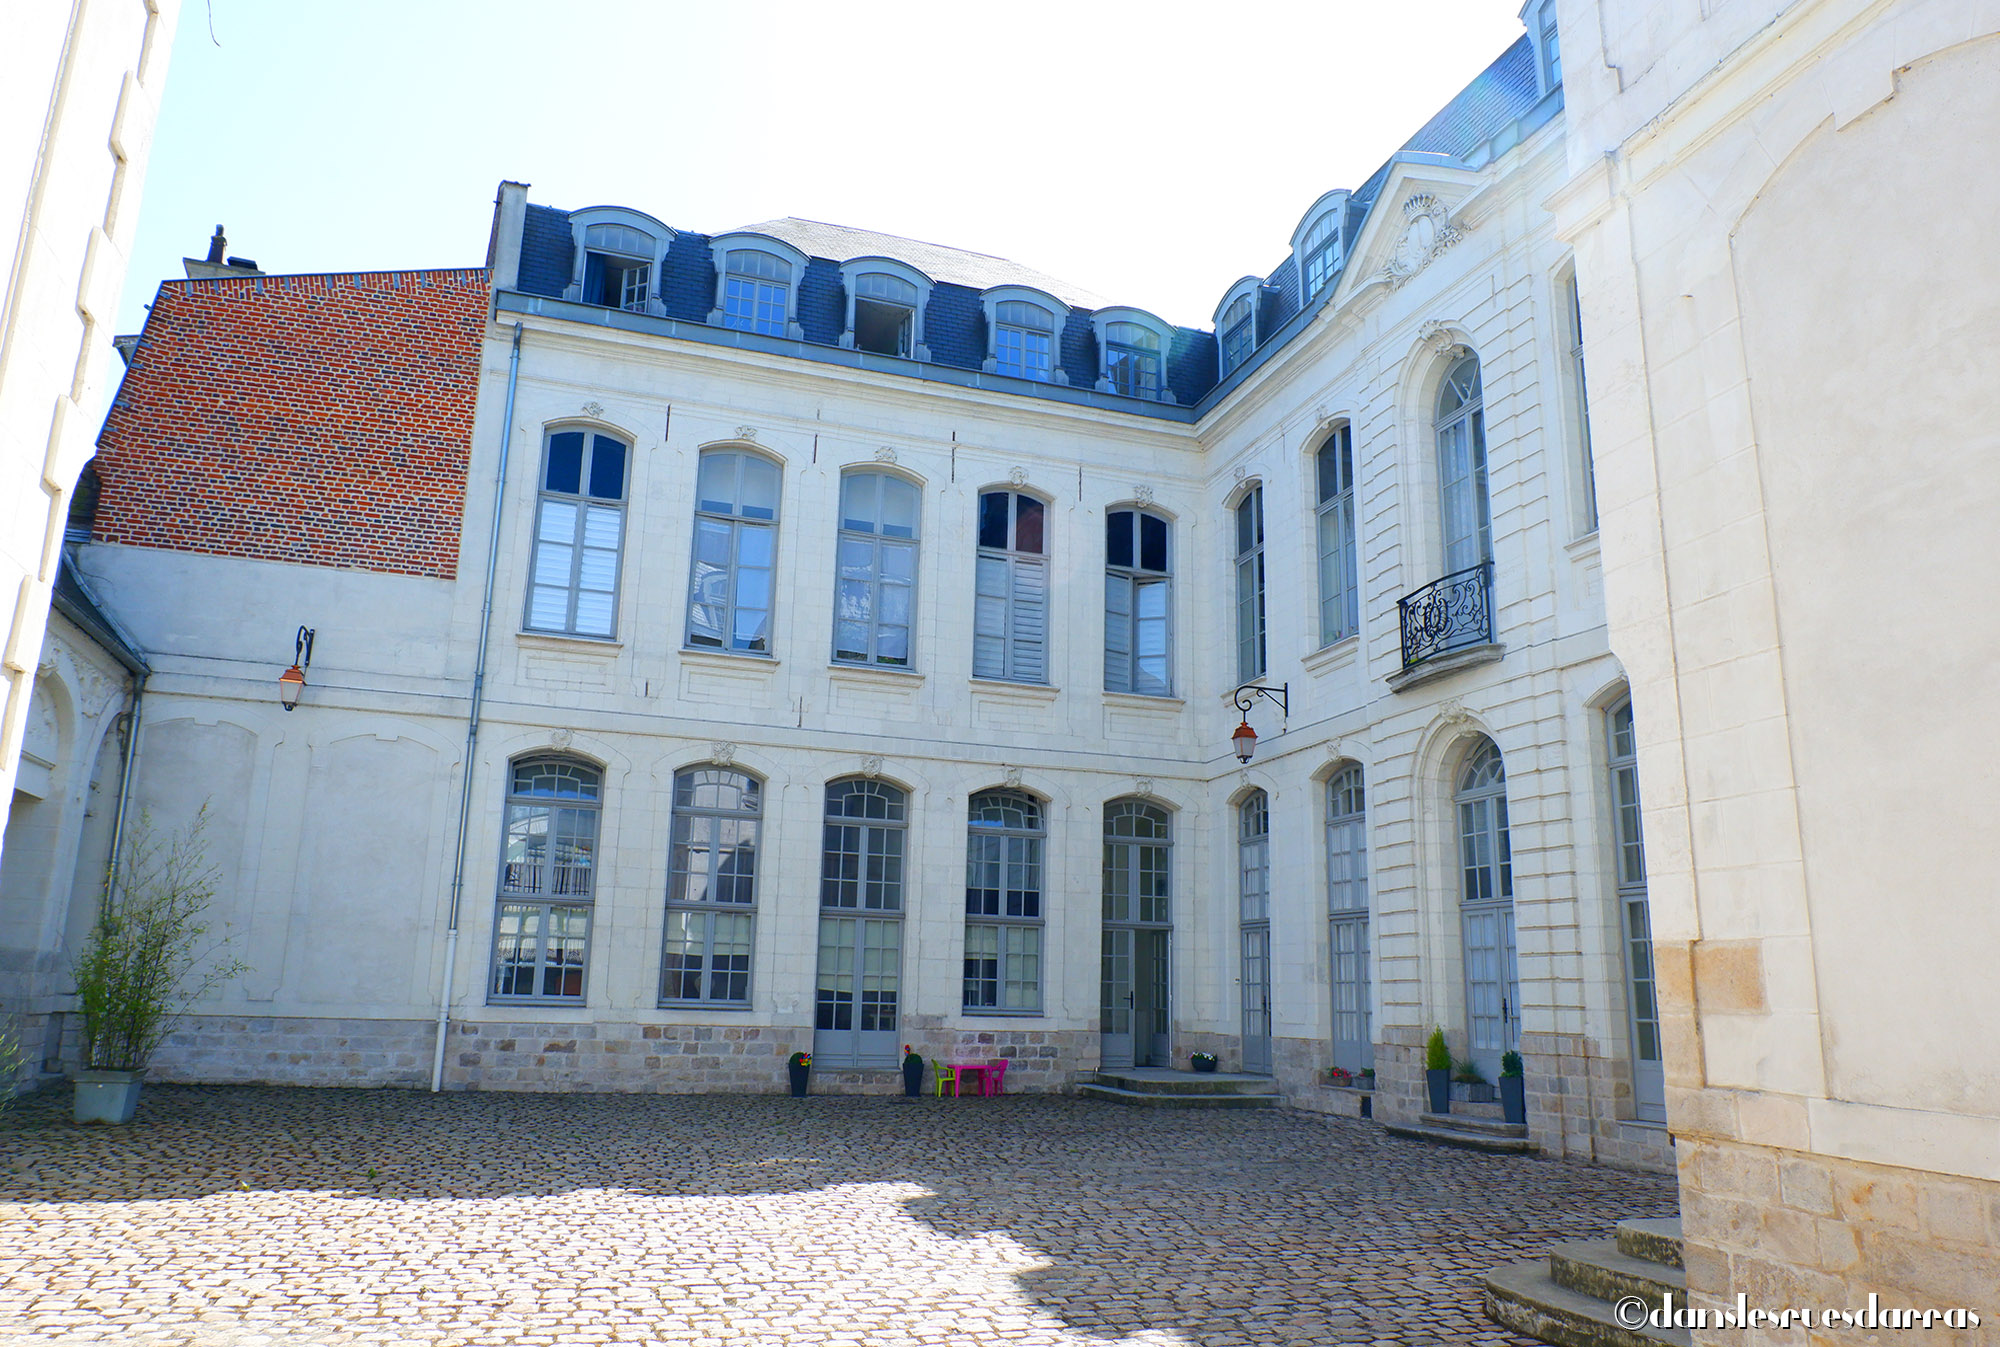 Hôtel de la Basecque - 12 rue Emile Legrelle - Arras (©MD - danslesruesdarras)